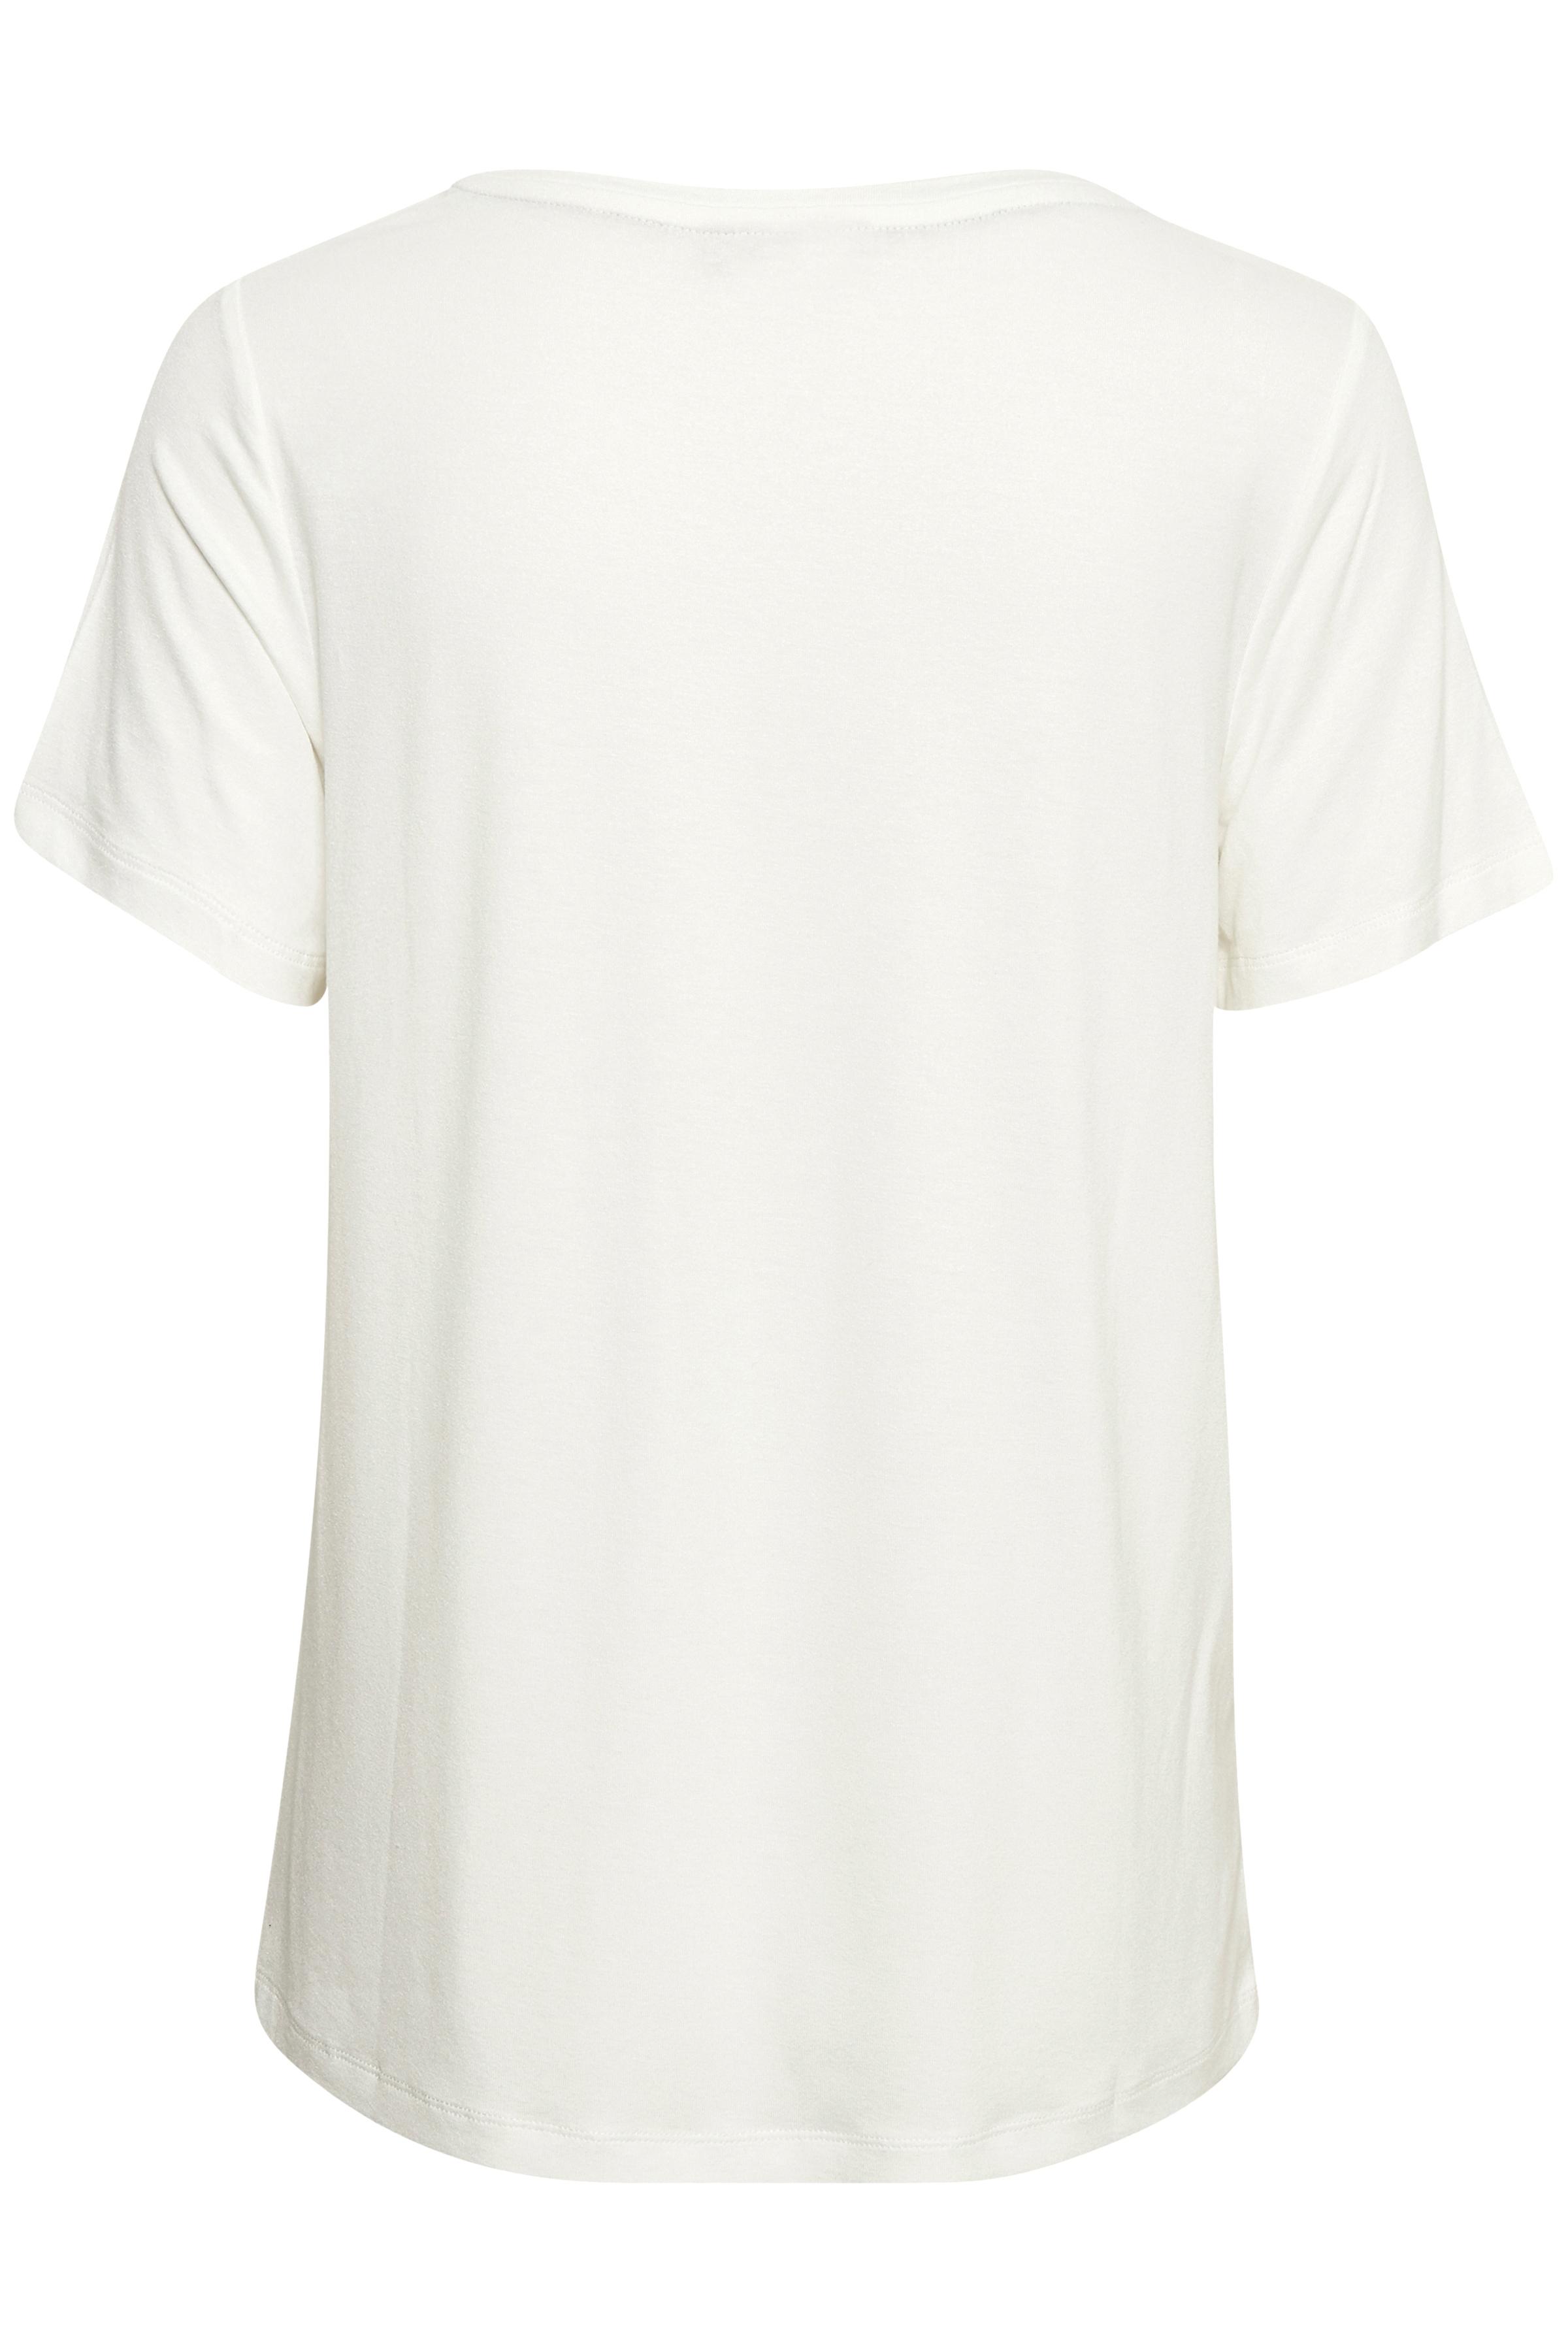 Off-white Kortærmet T-shirt fra Bon'A Parte – Køb Off-white Kortærmet T-shirt fra str. S-2XL her